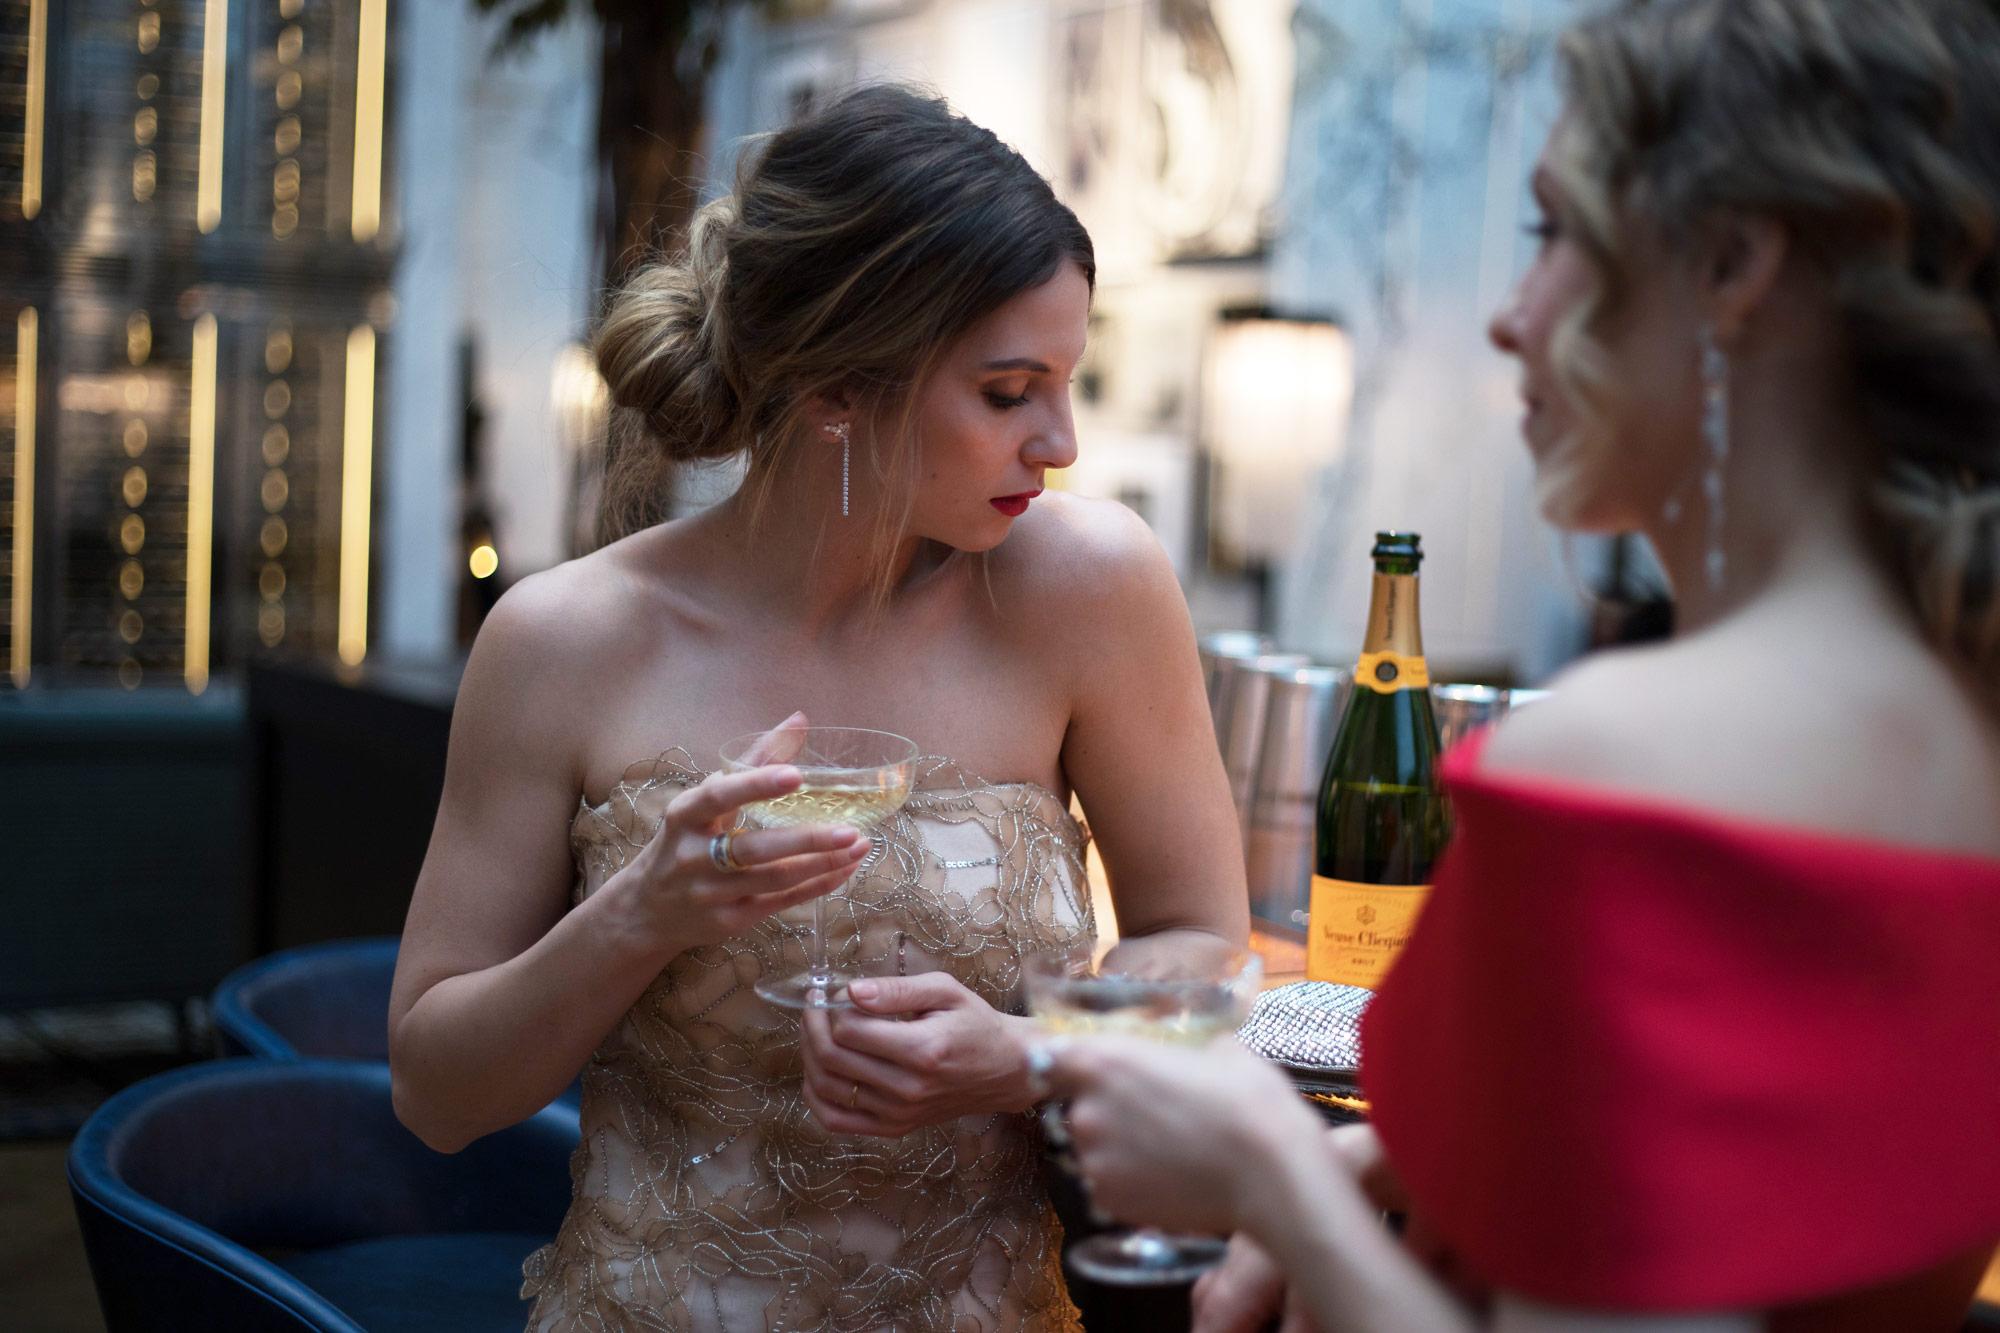 Cinderella Moment, glam room, romy gala 2017. romy gala red carpet, romy gala look